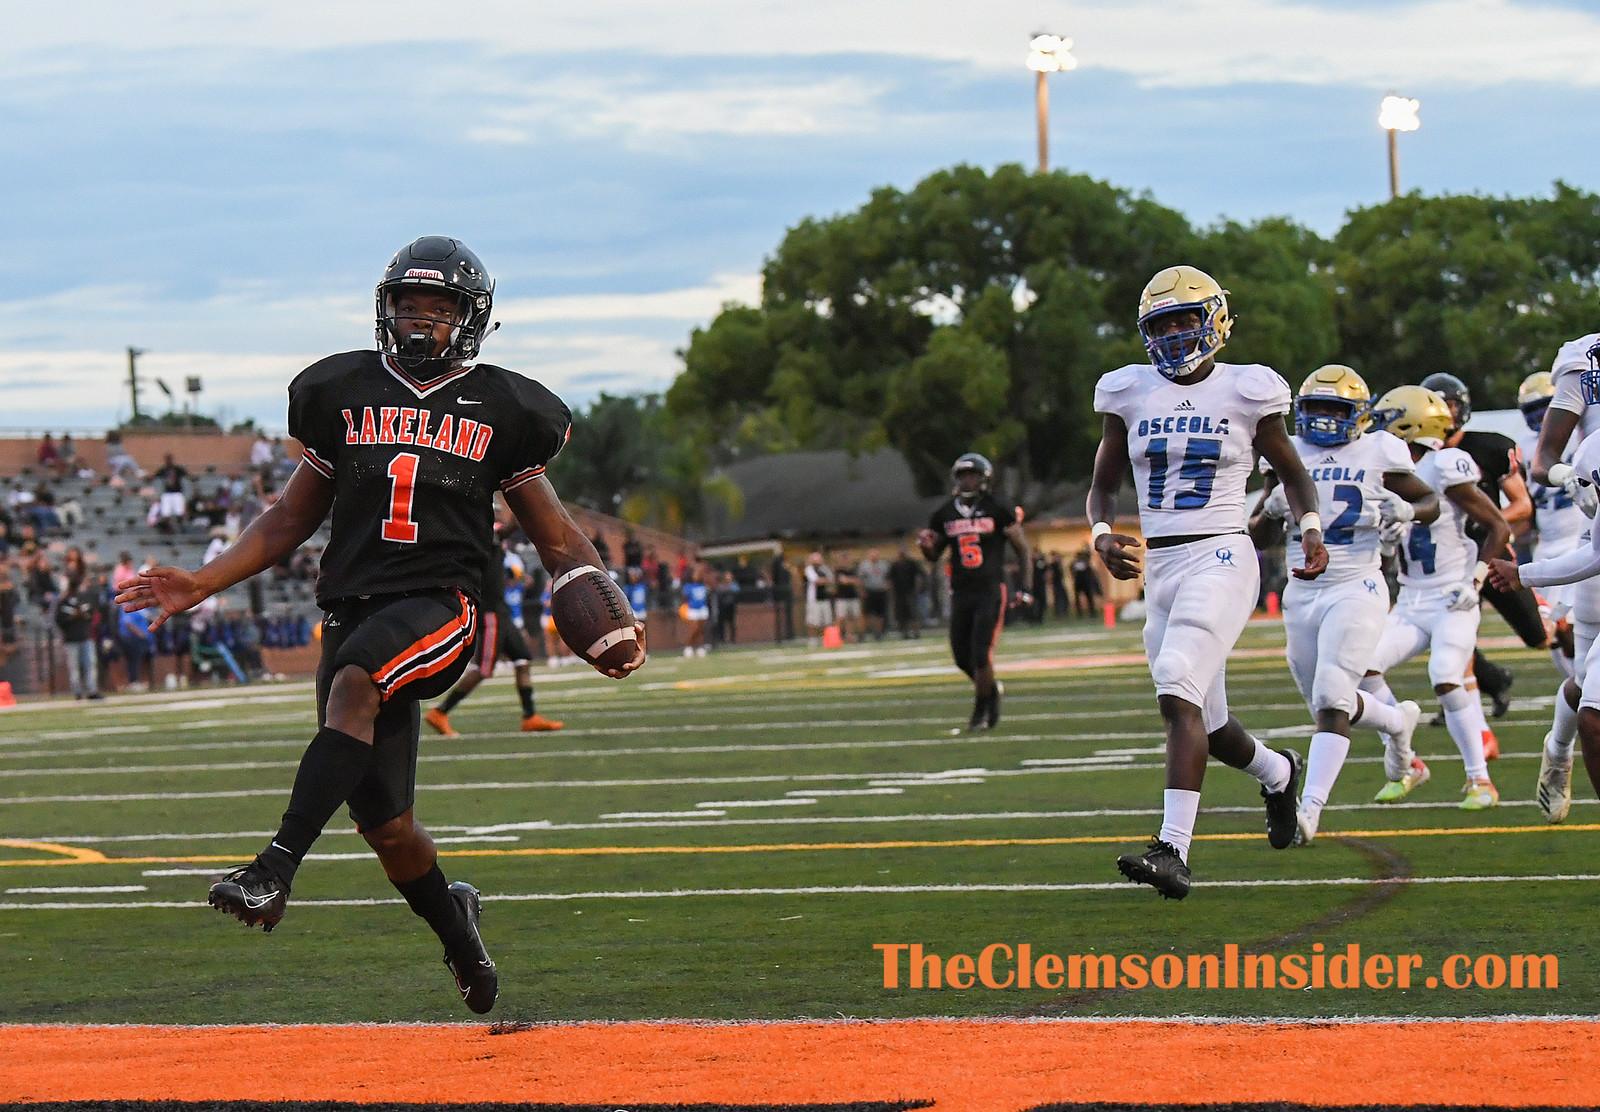 Clemson commit Lakeland (Fl) High running back Demarkcus Bowman plays against Kissimmee Osceola Friday, August 16, 2019 in Lakeland, Fl. Bart Boatwright/The Clemson Insider